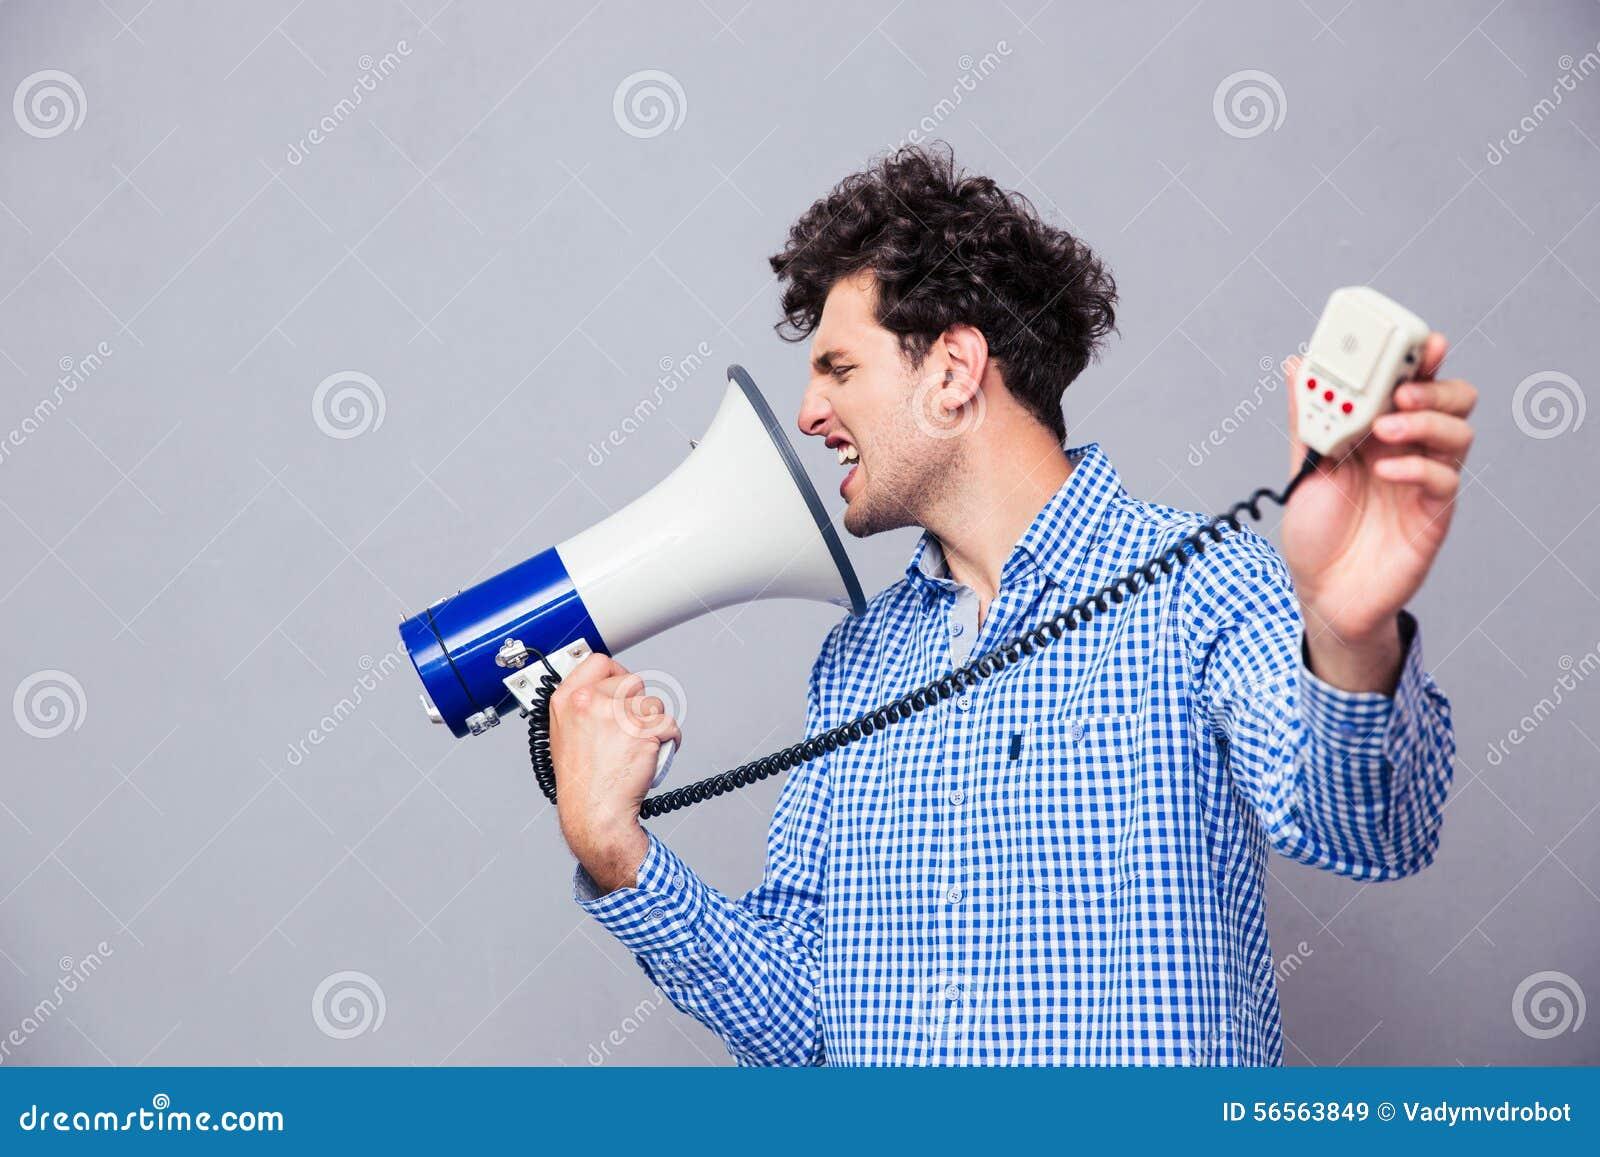 Download Άτομο που κατευθύνει Megaphone σε την Στοκ Εικόνα - εικόνα από γραφείο, προσωπικότητα: 56563849